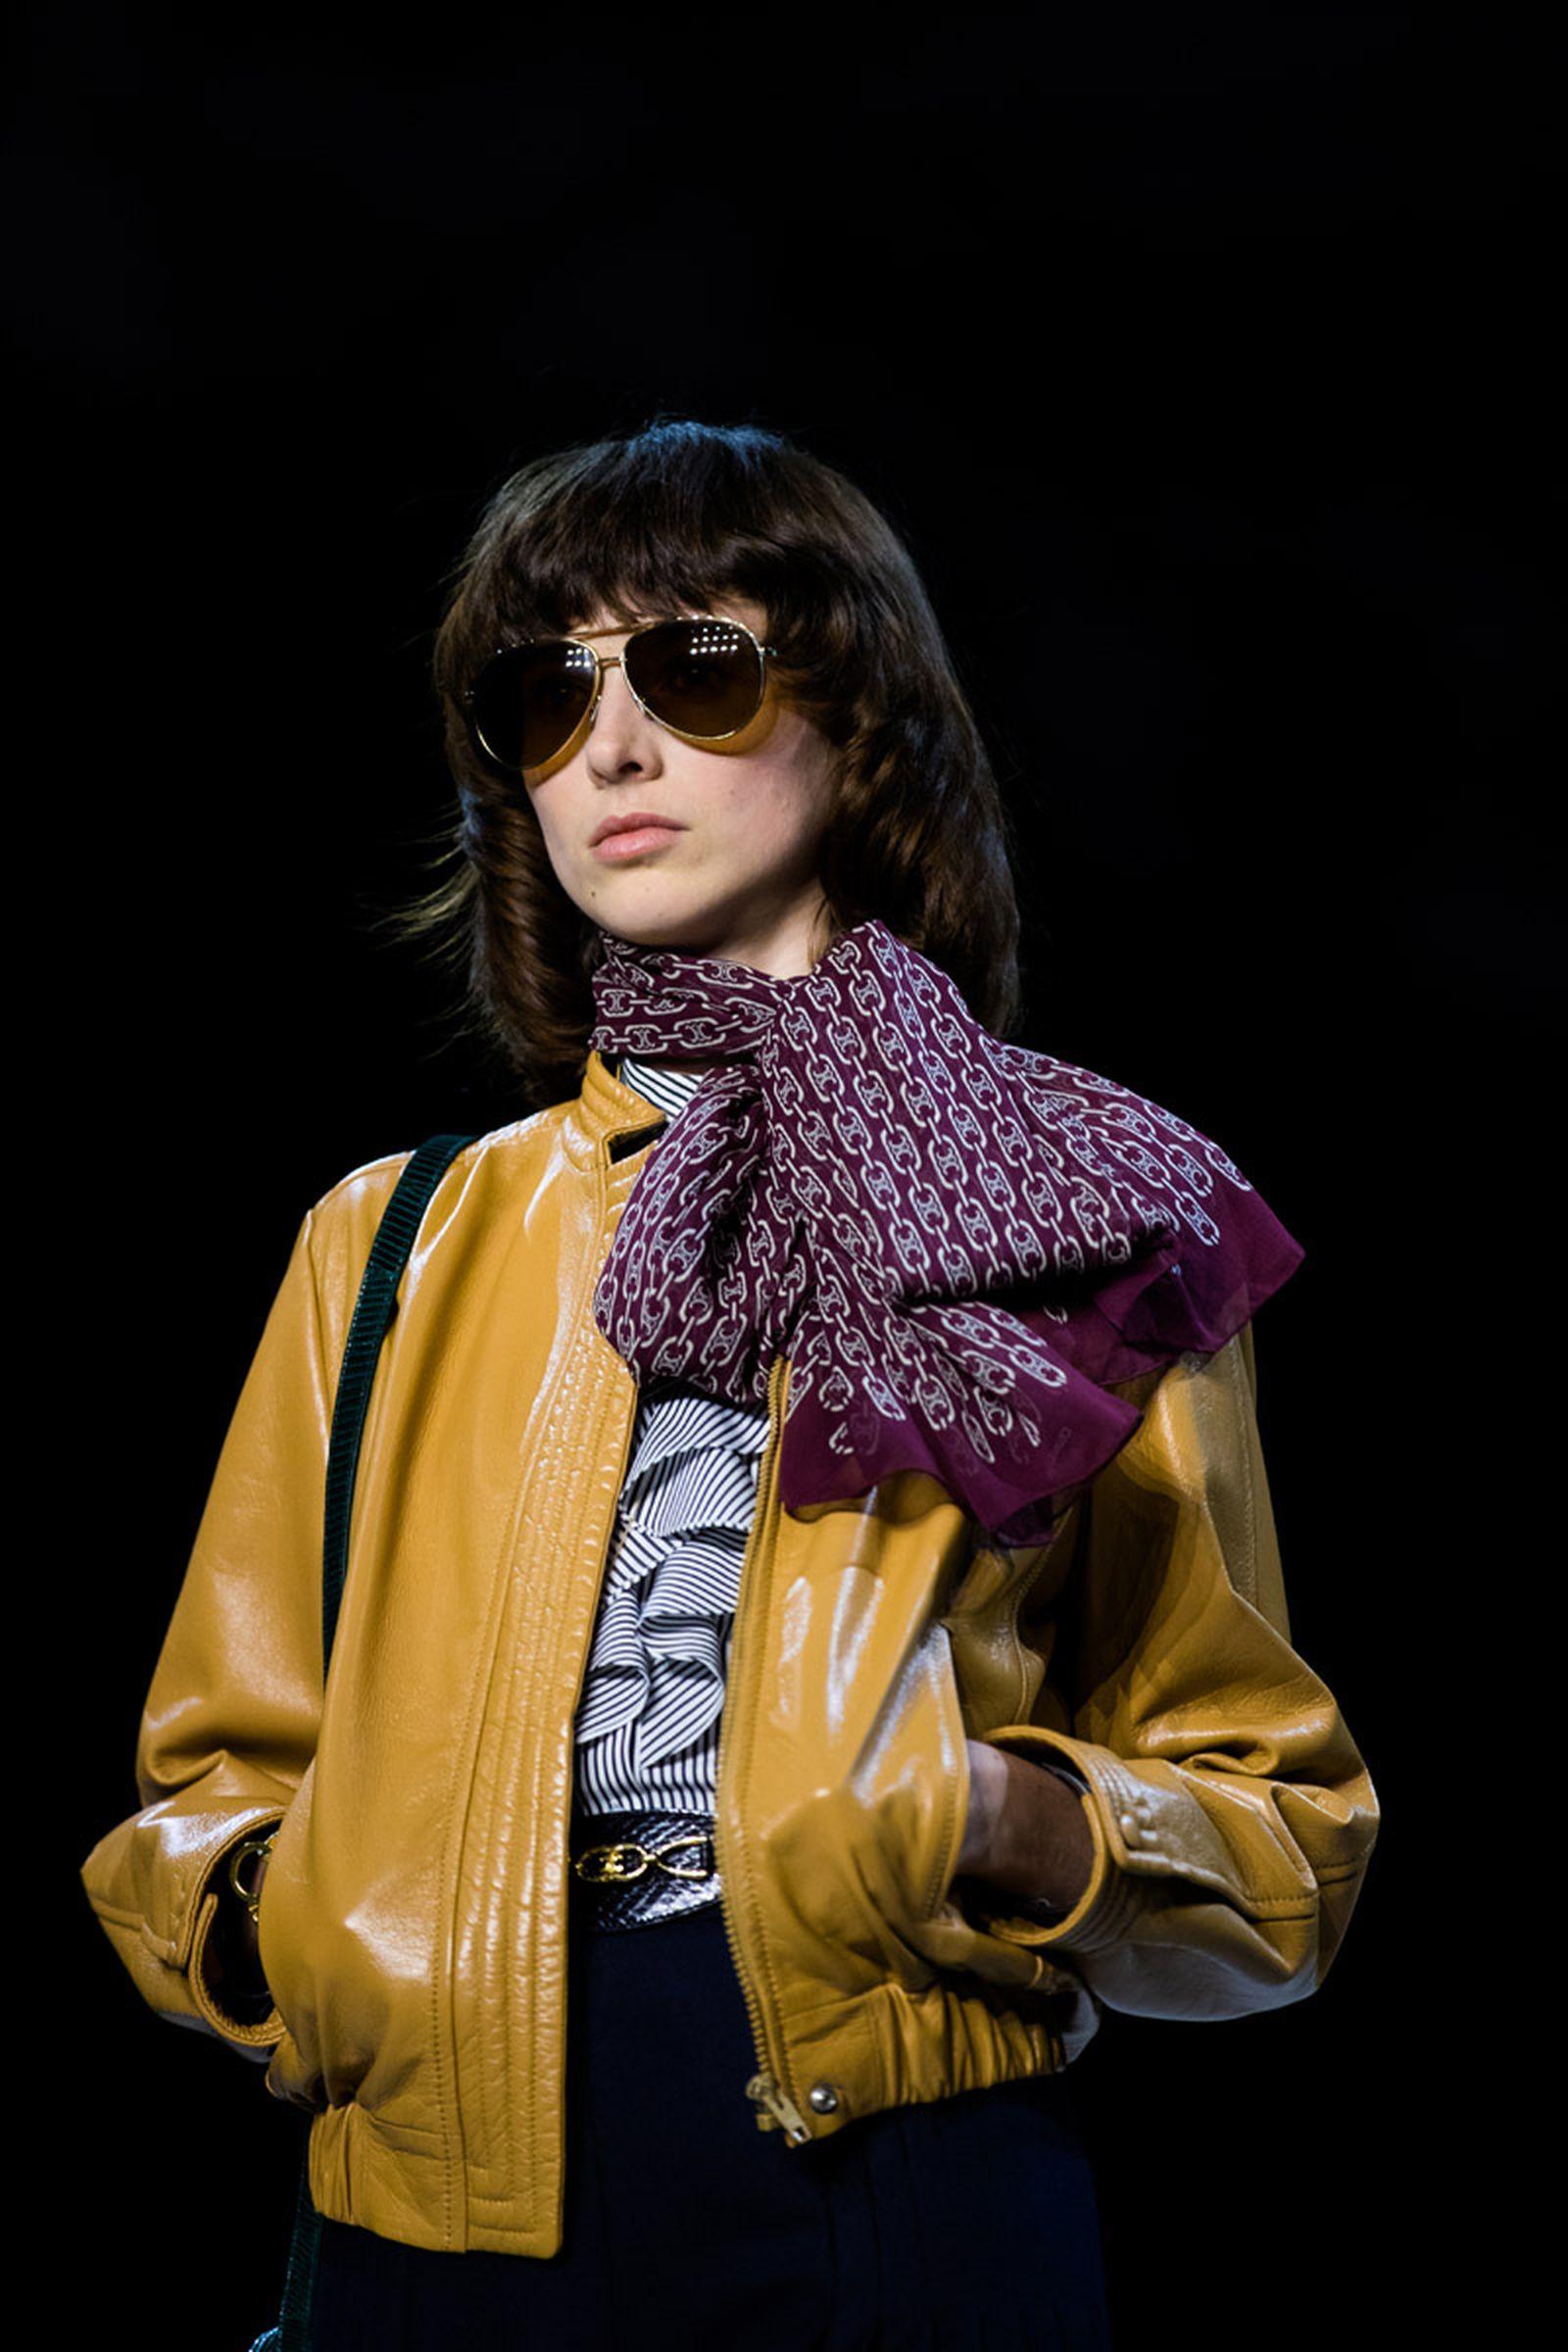 11celine fw19 womens paris fashion week